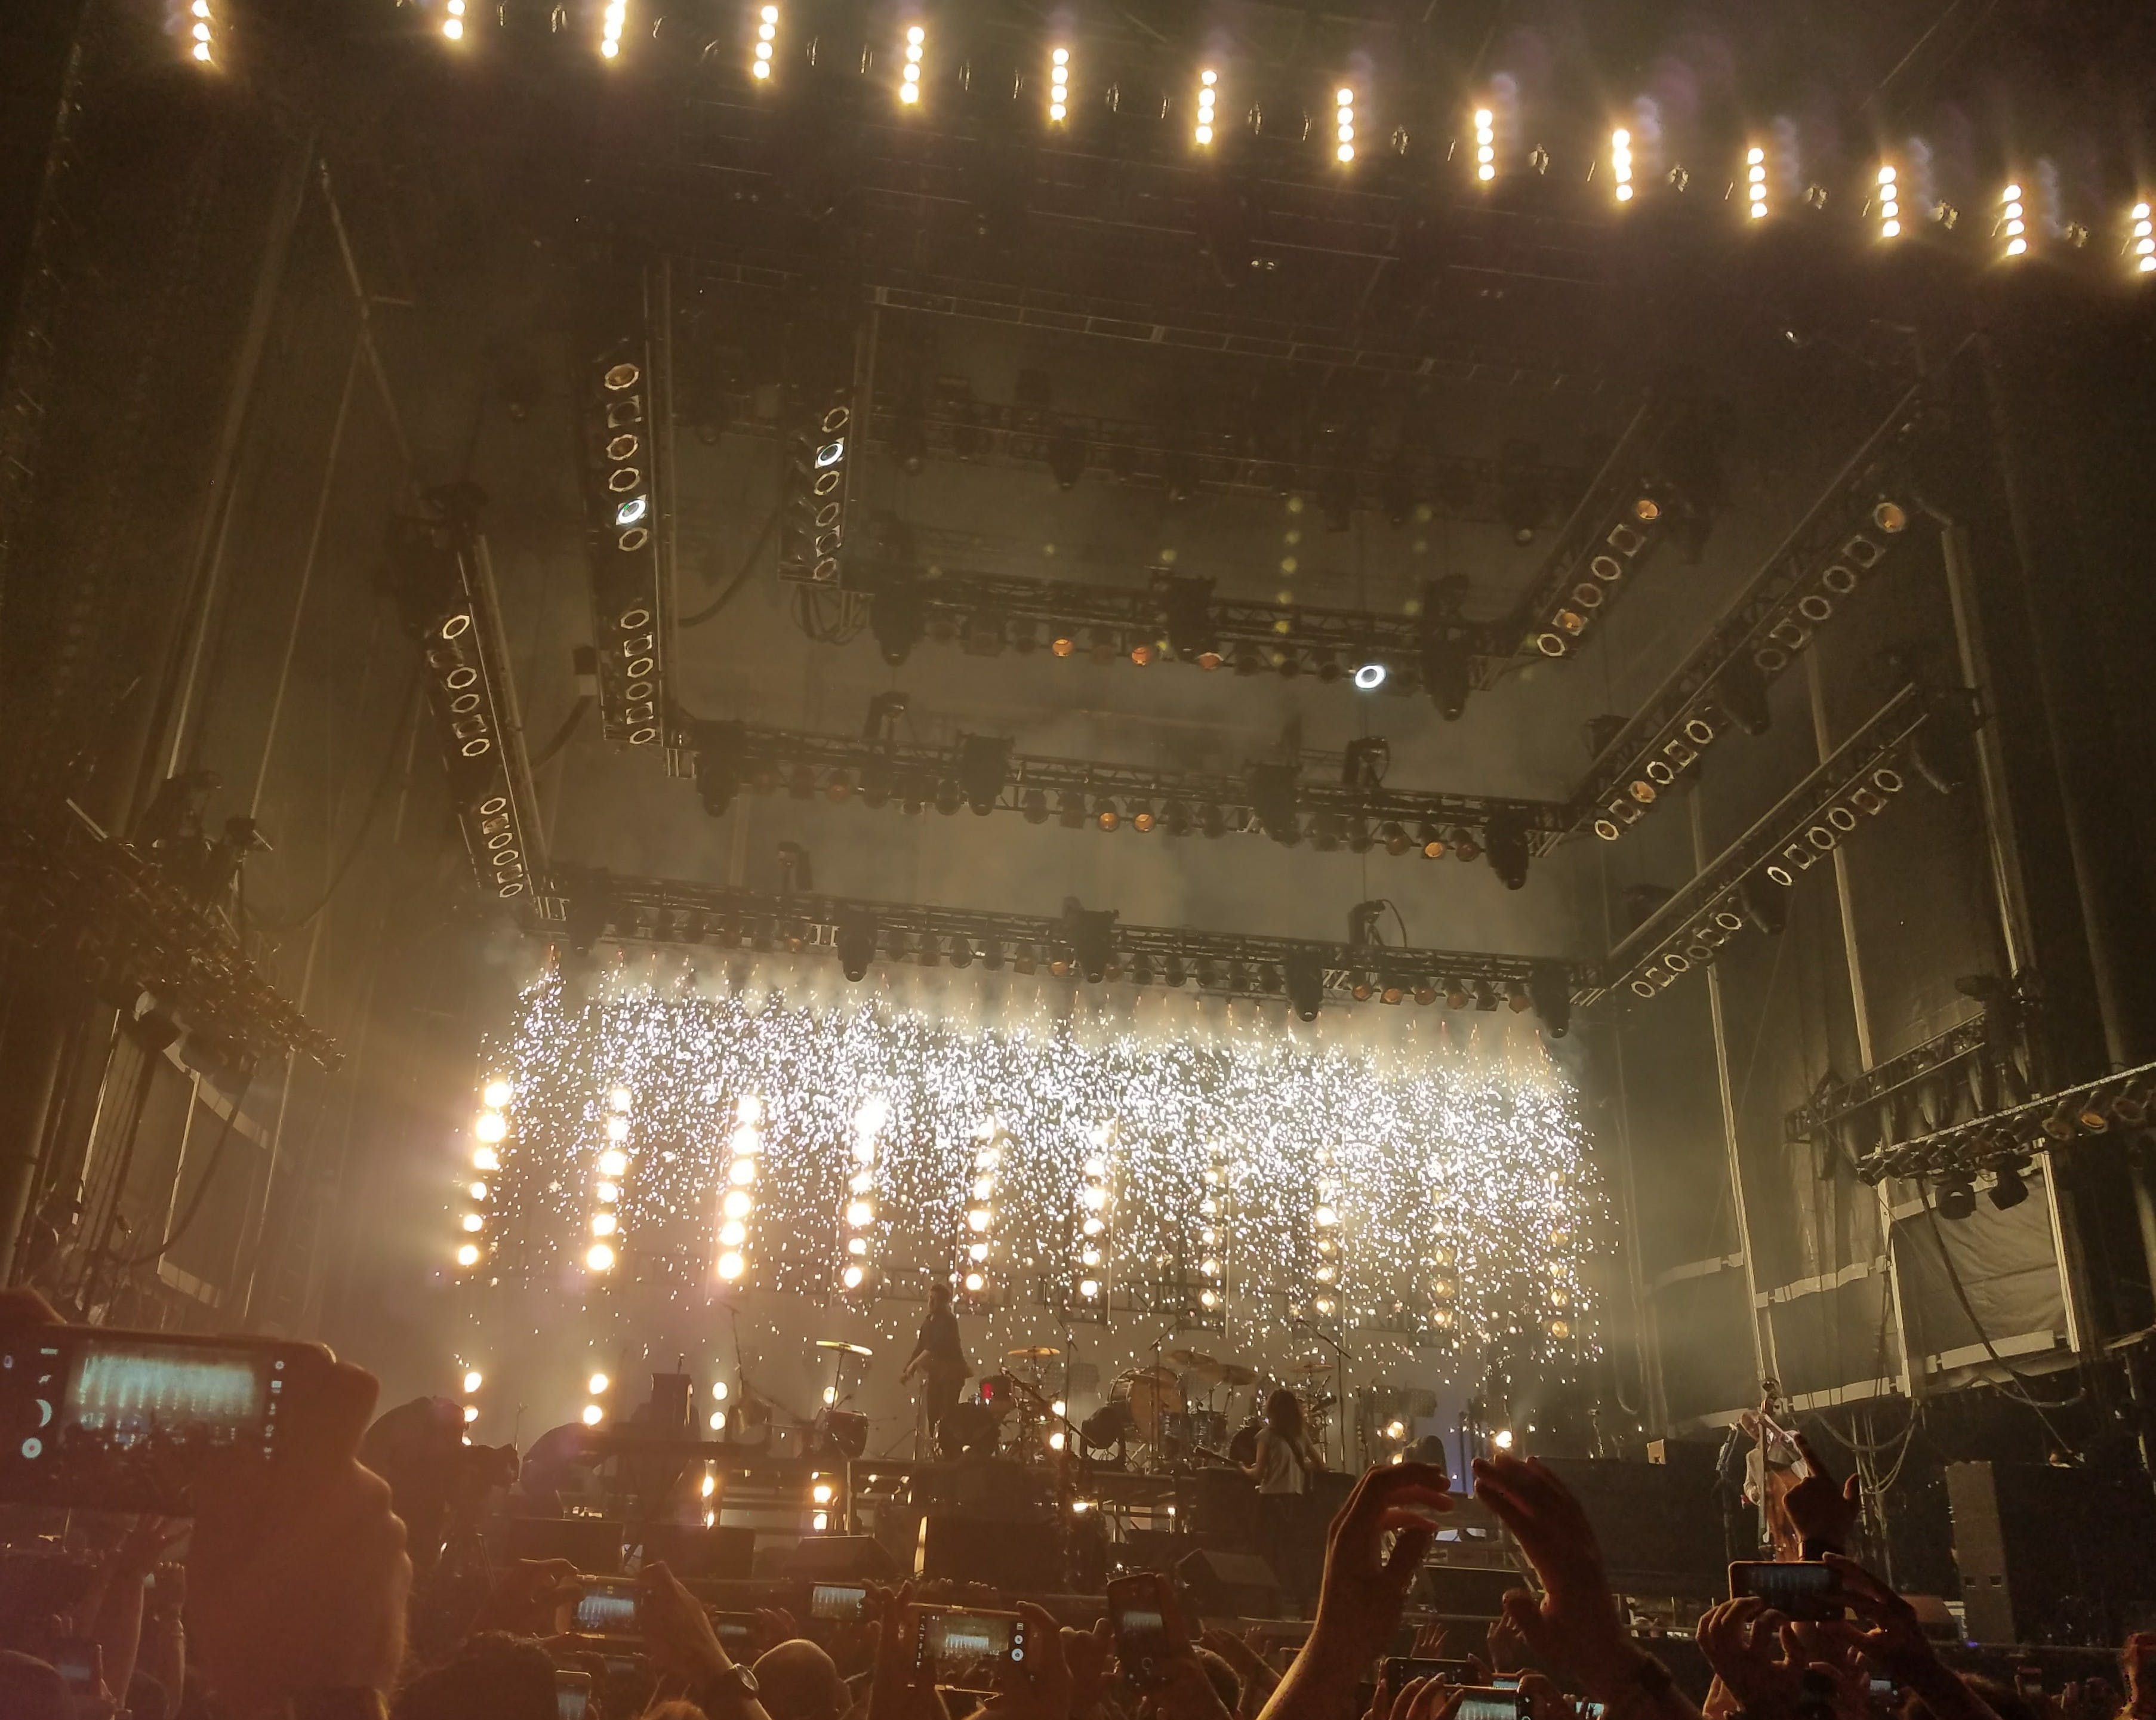 Kostenloses Stock Foto zu aufführung, band, beleuchtet, beleuchtung